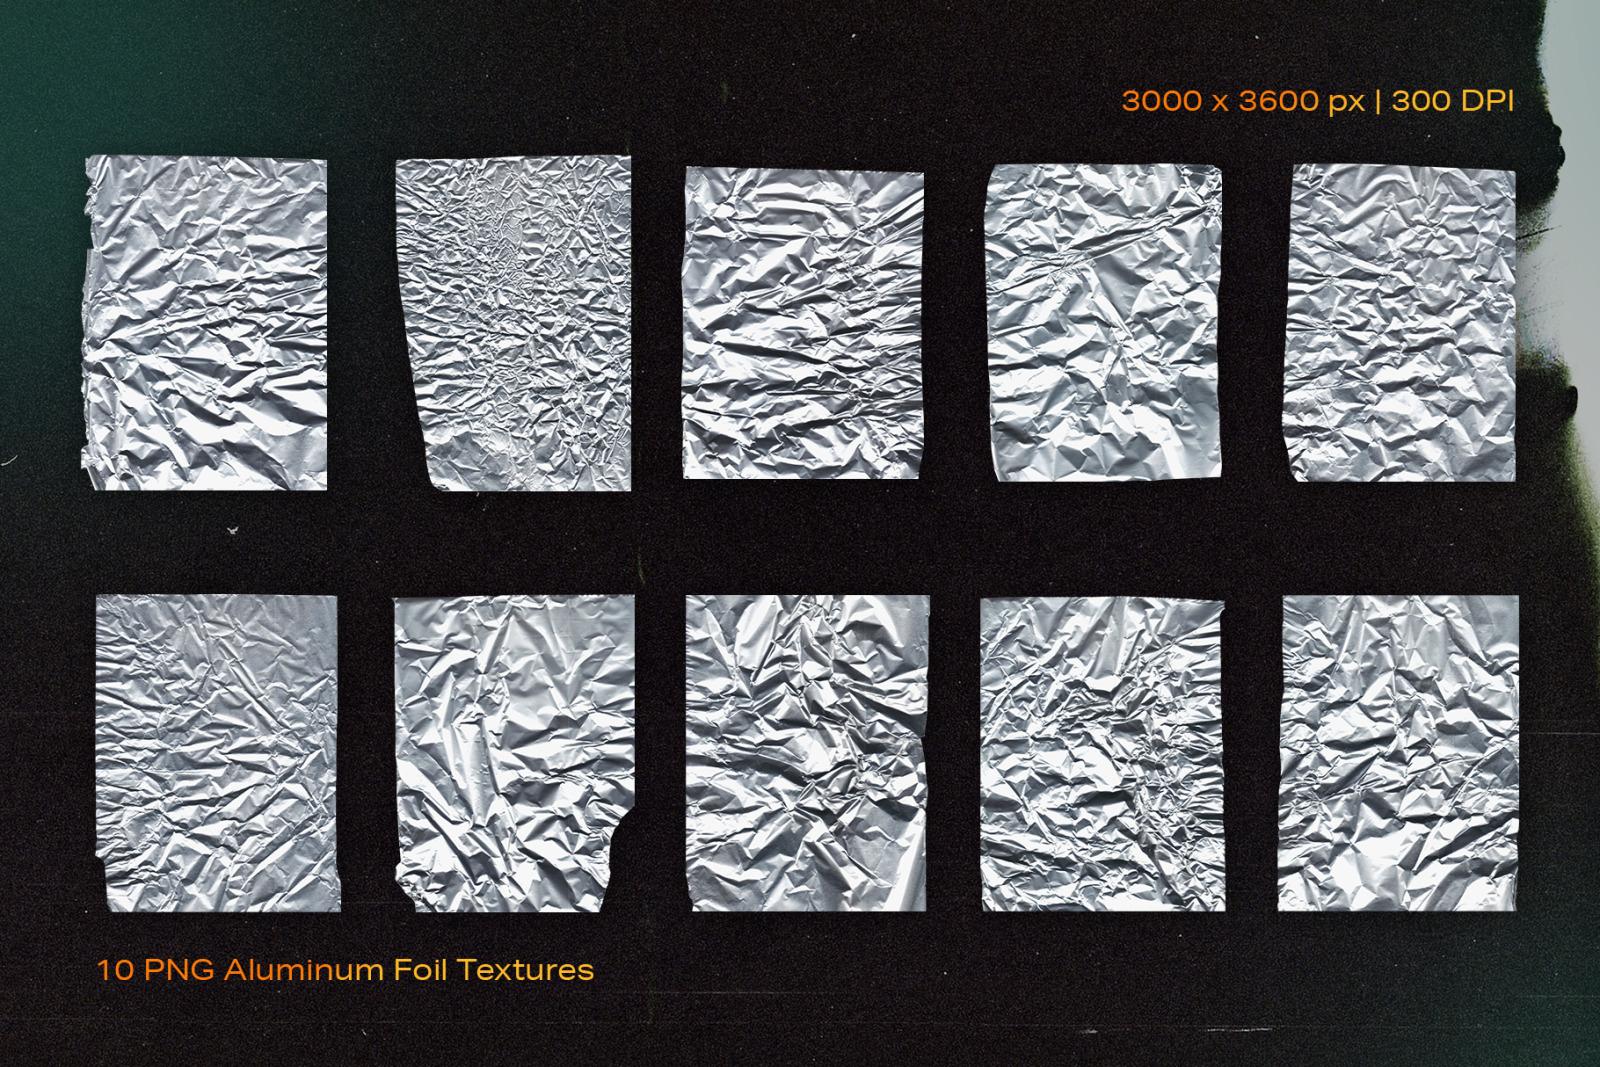 Aluminum Foil Textures